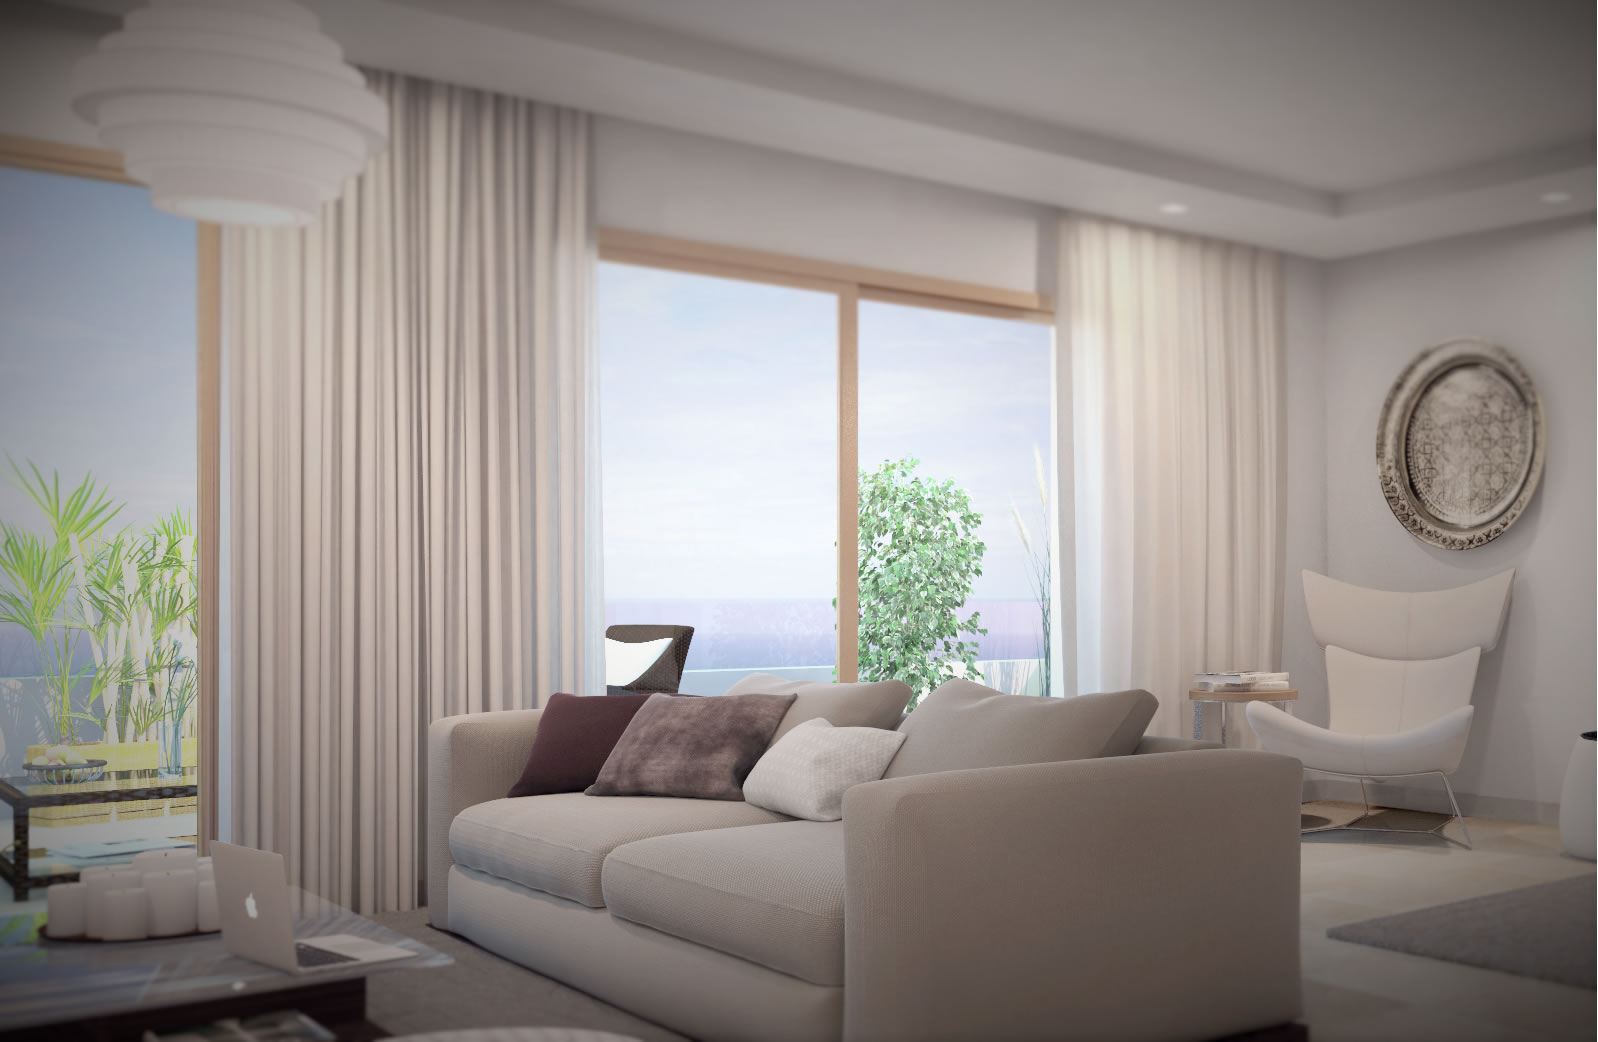 Appartement casablanca appartement de la r sidence bellerive for Design appartement maroc